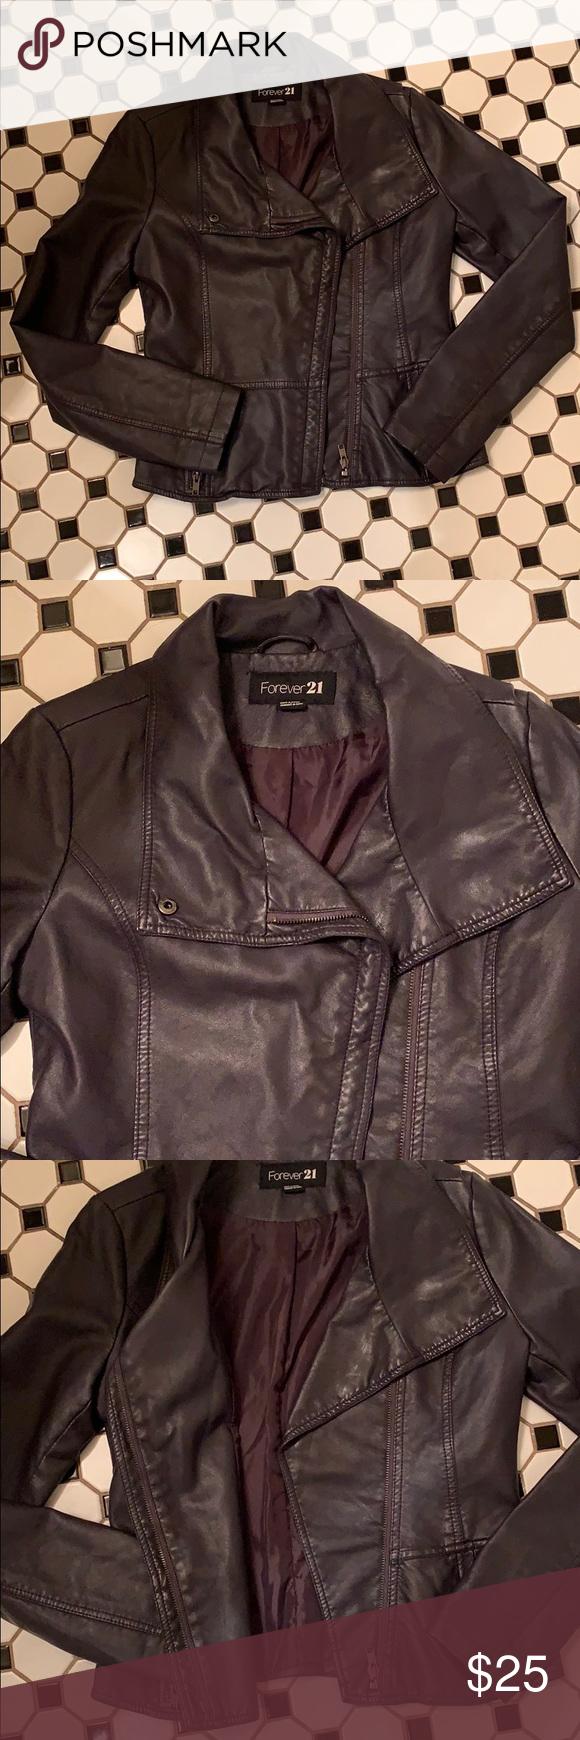 Forever 21 Purple Faux Leather Jacket Coat Purple Faux Leather Jacket Leather Jacket Faux Leather Jackets [ 1740 x 580 Pixel ]